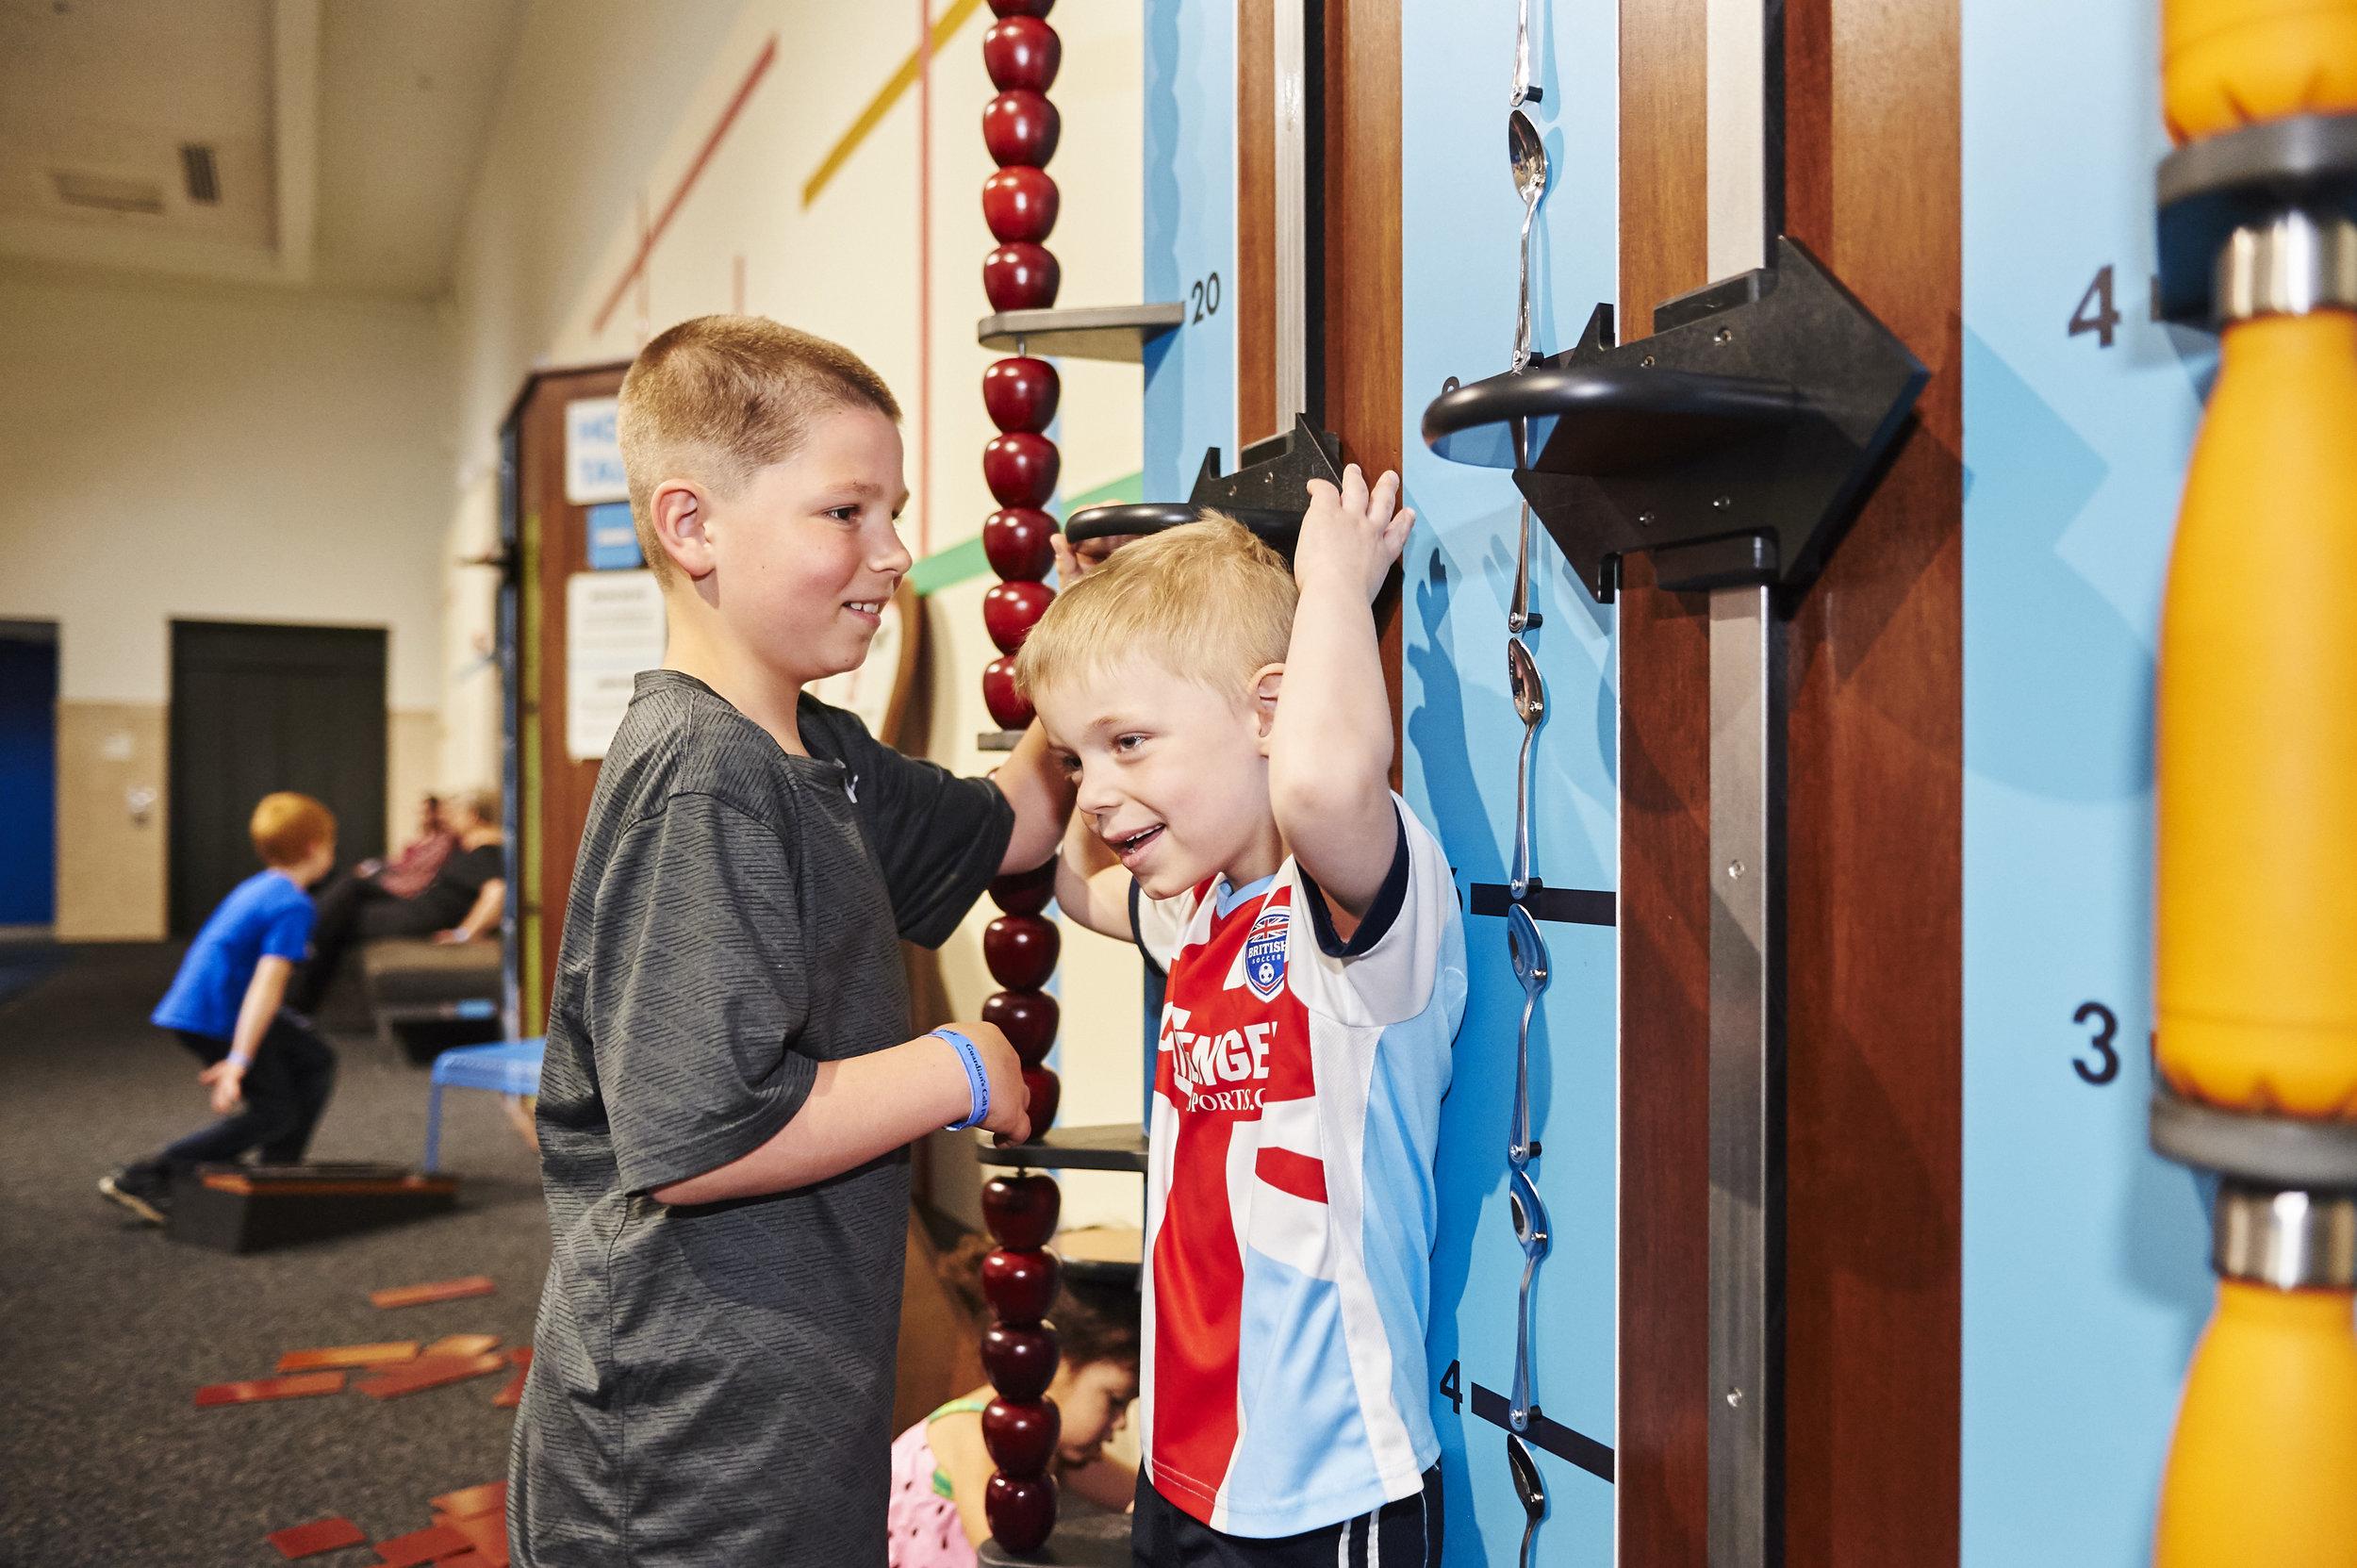 170417_ChildrensMuseum_Measure_095.jpg